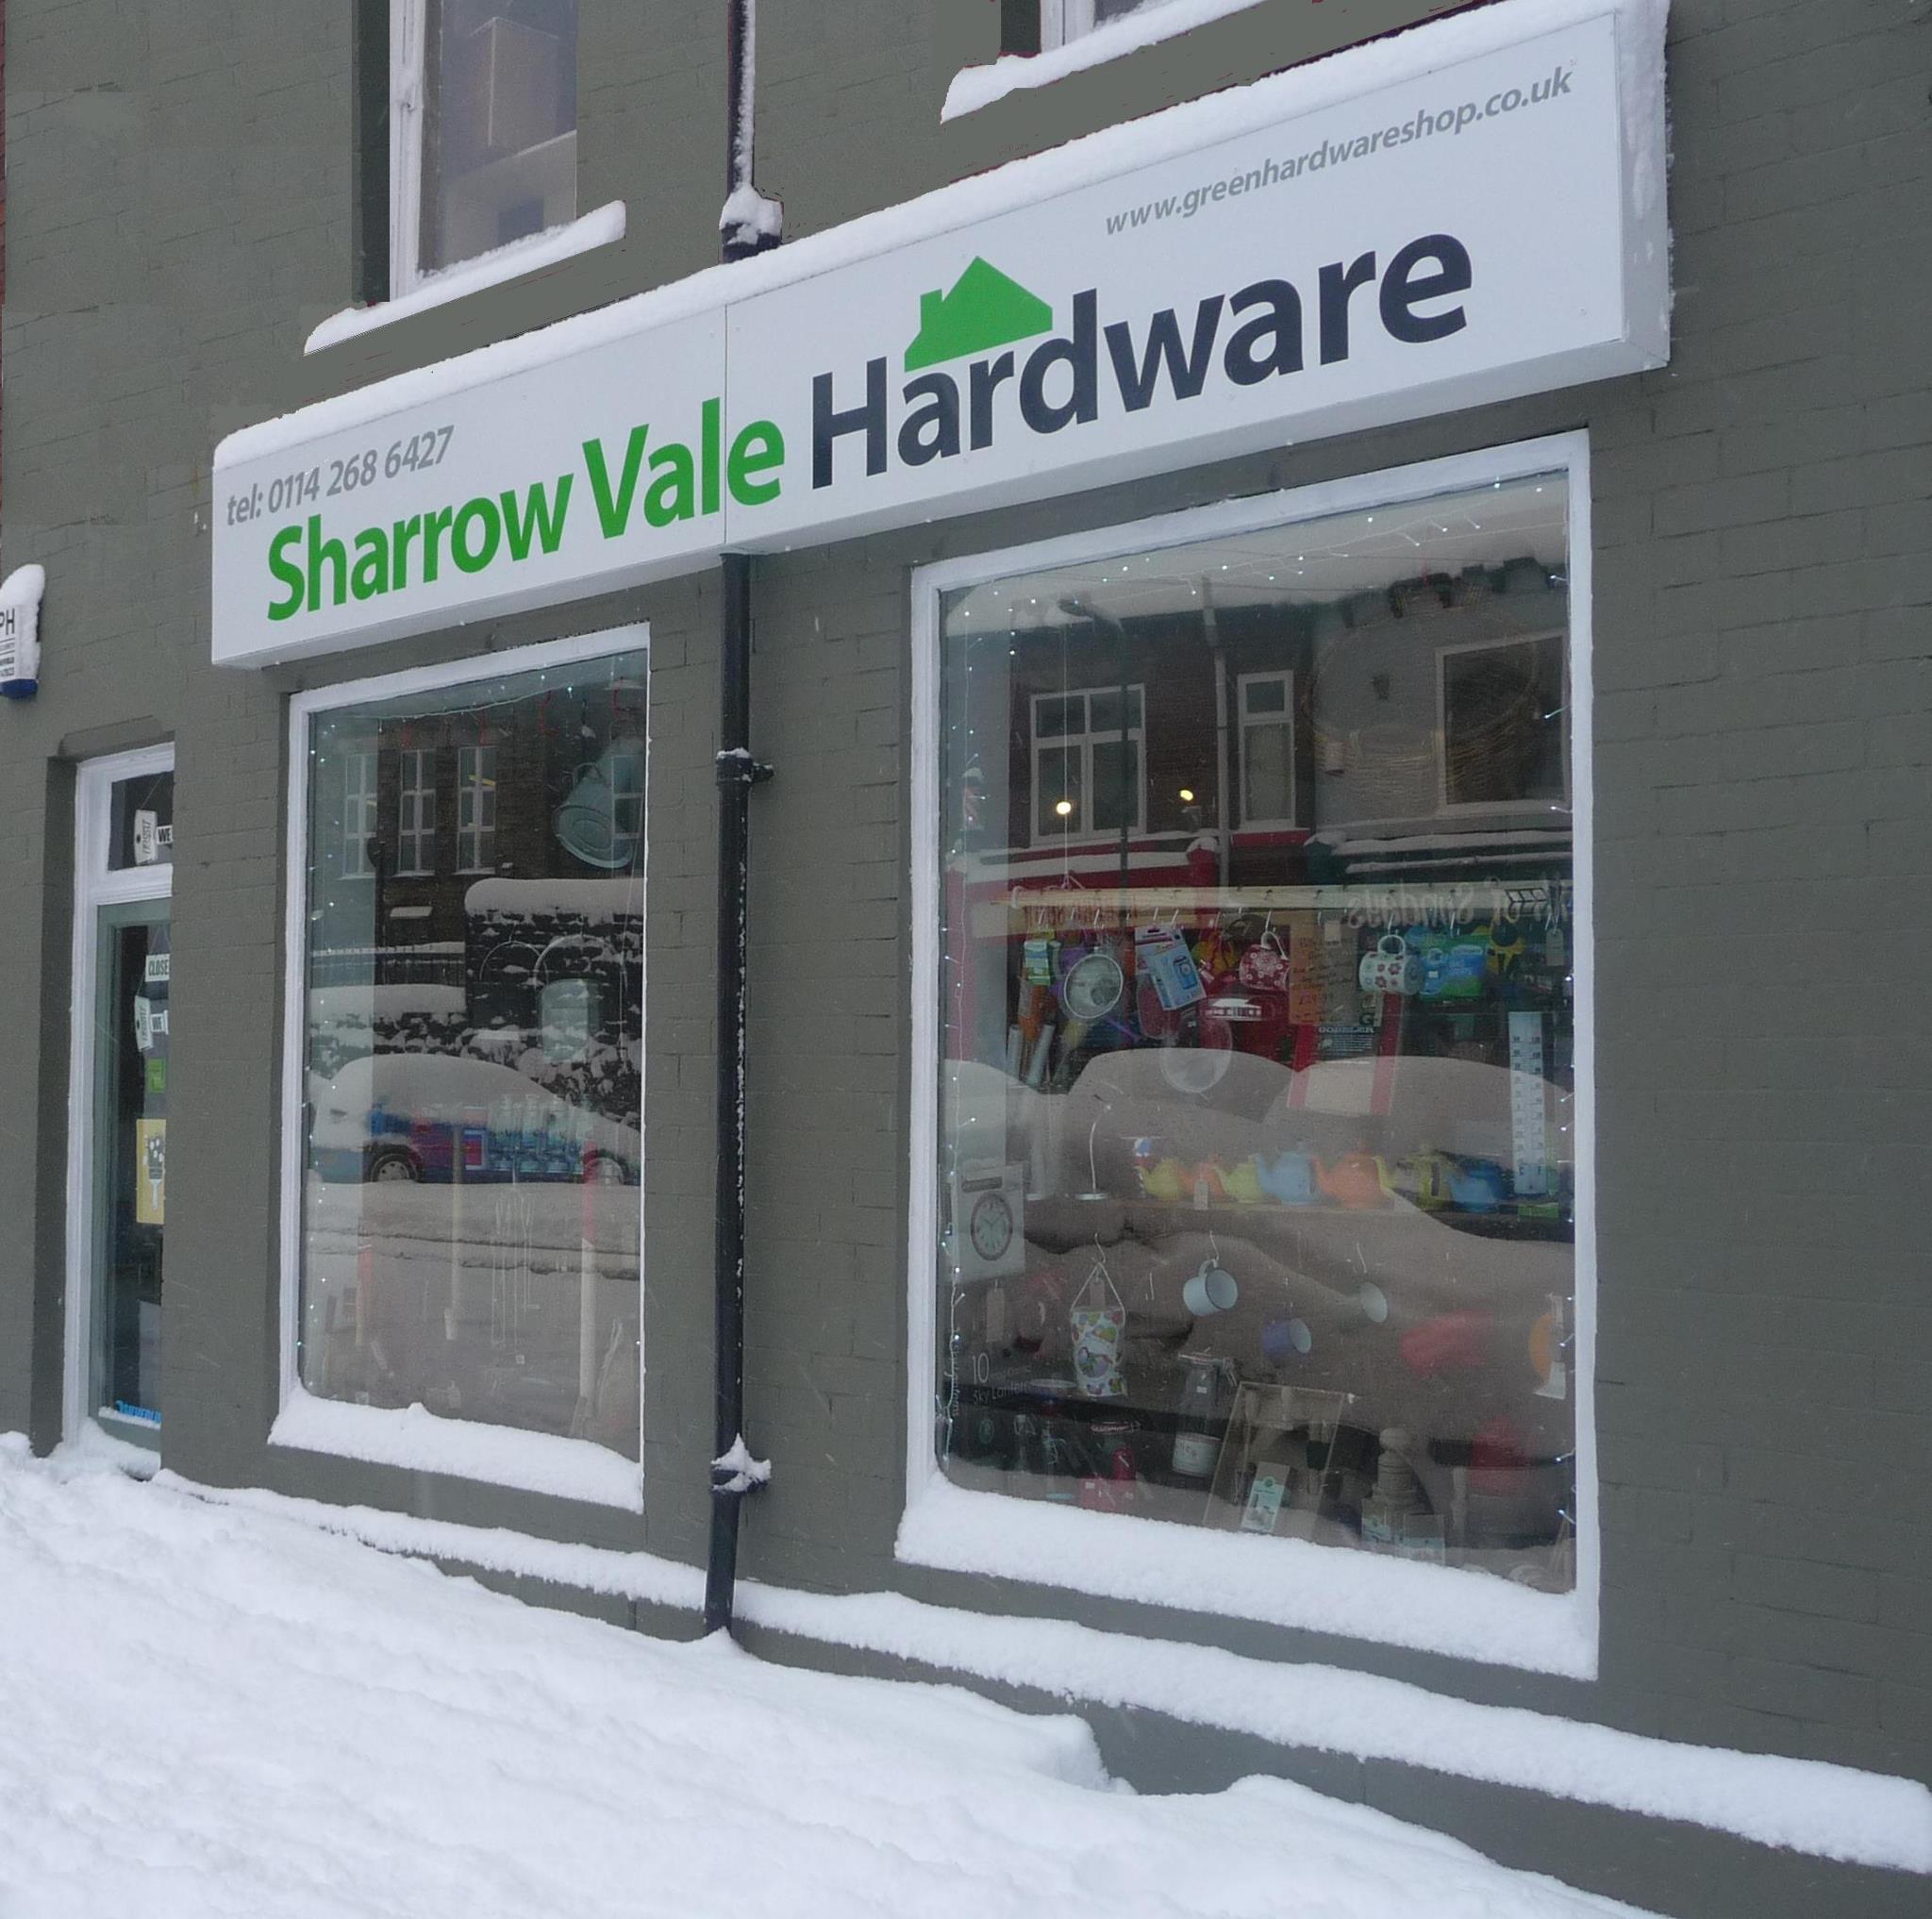 Sharrow Vale Hardware